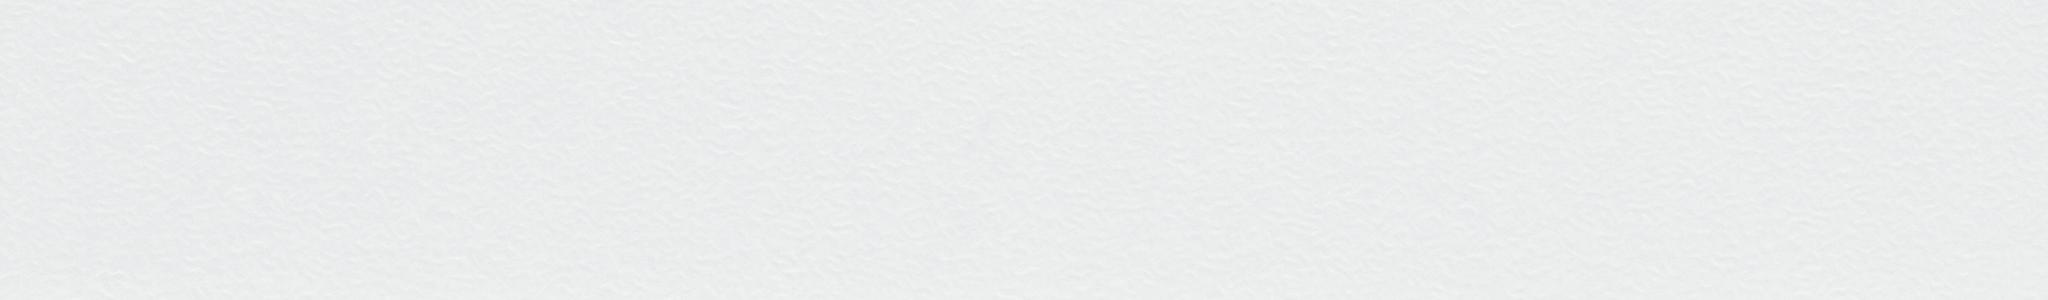 HU 37014 Melamin Kante Grau perl